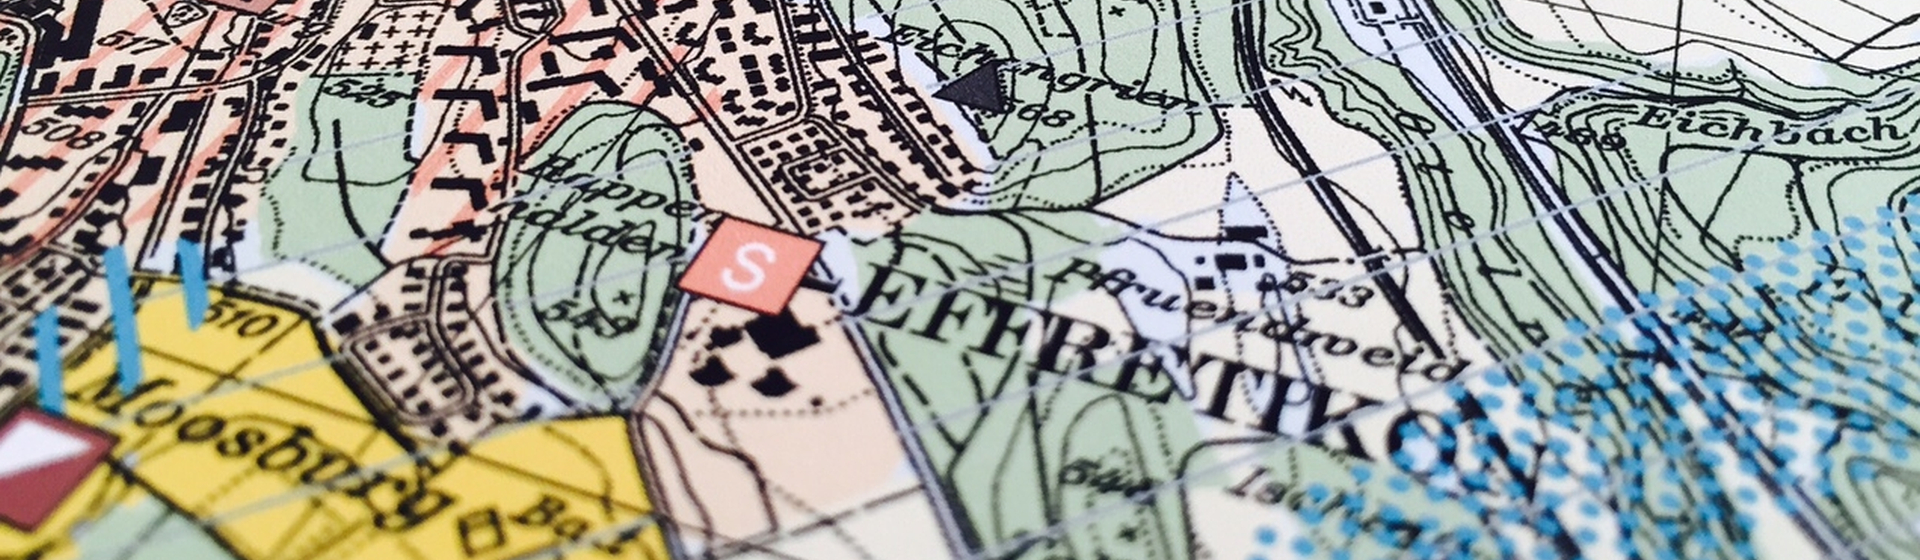 Symbolbild Ortsplanung; Stadtplan Effretikon